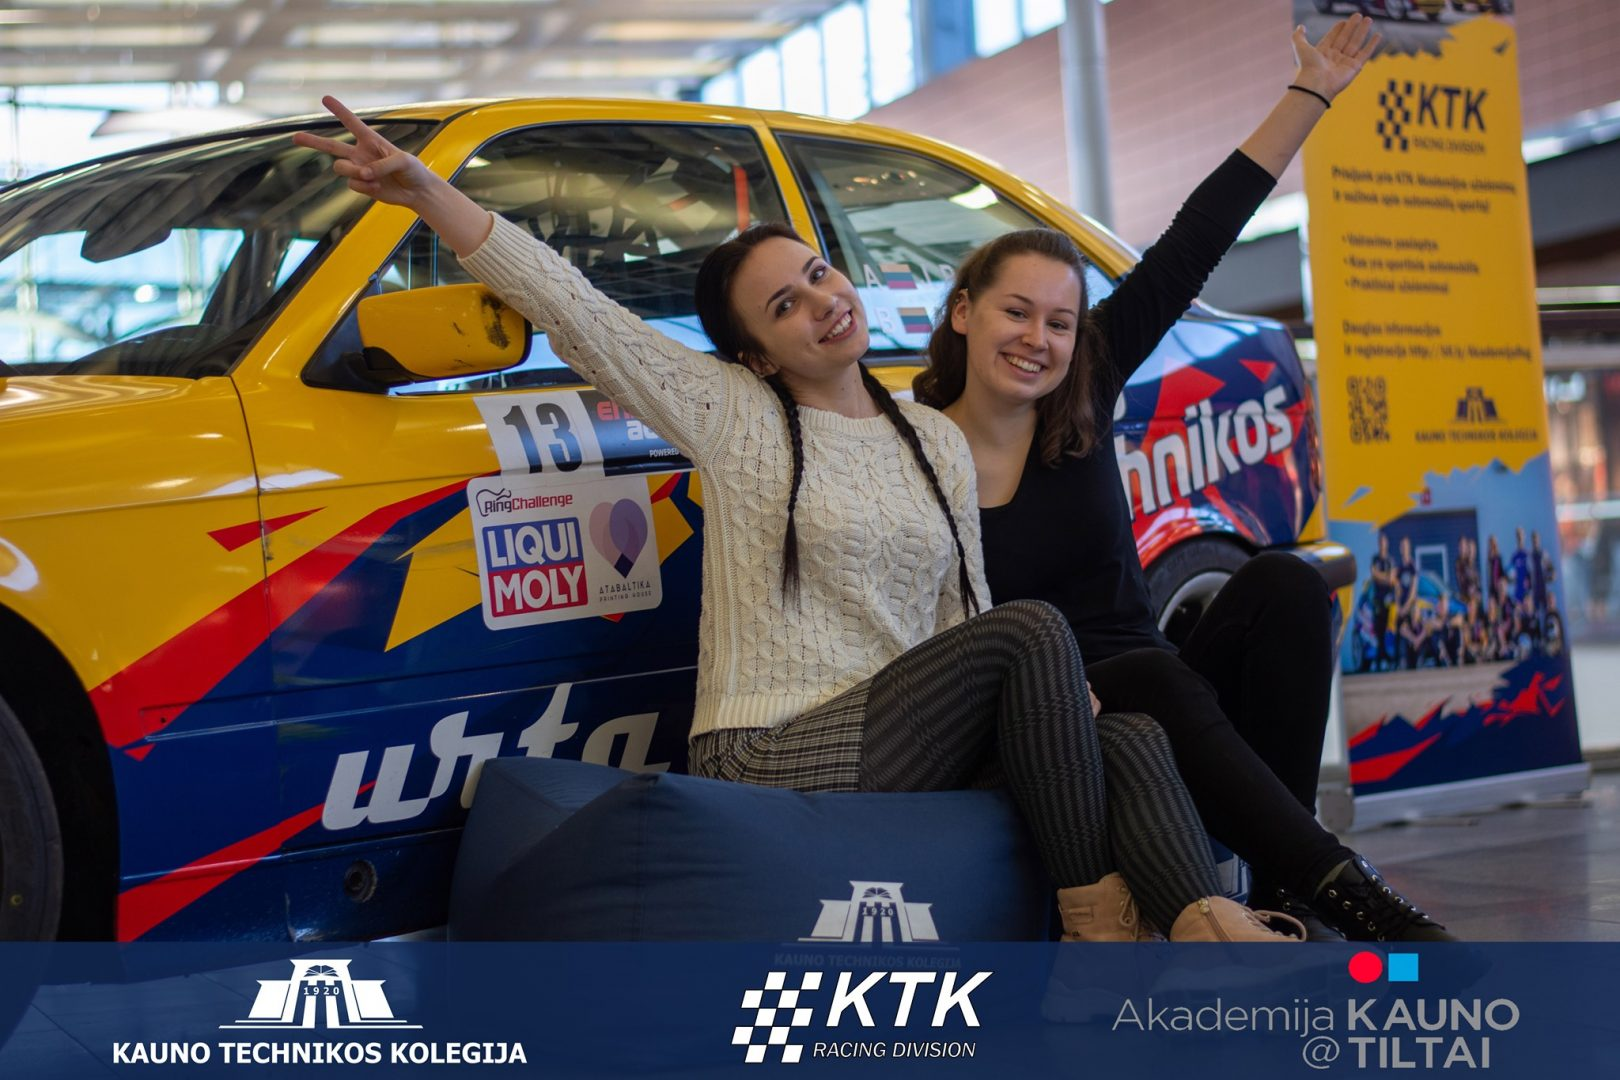 KTK Racing Division automobiliai Akropolyje!